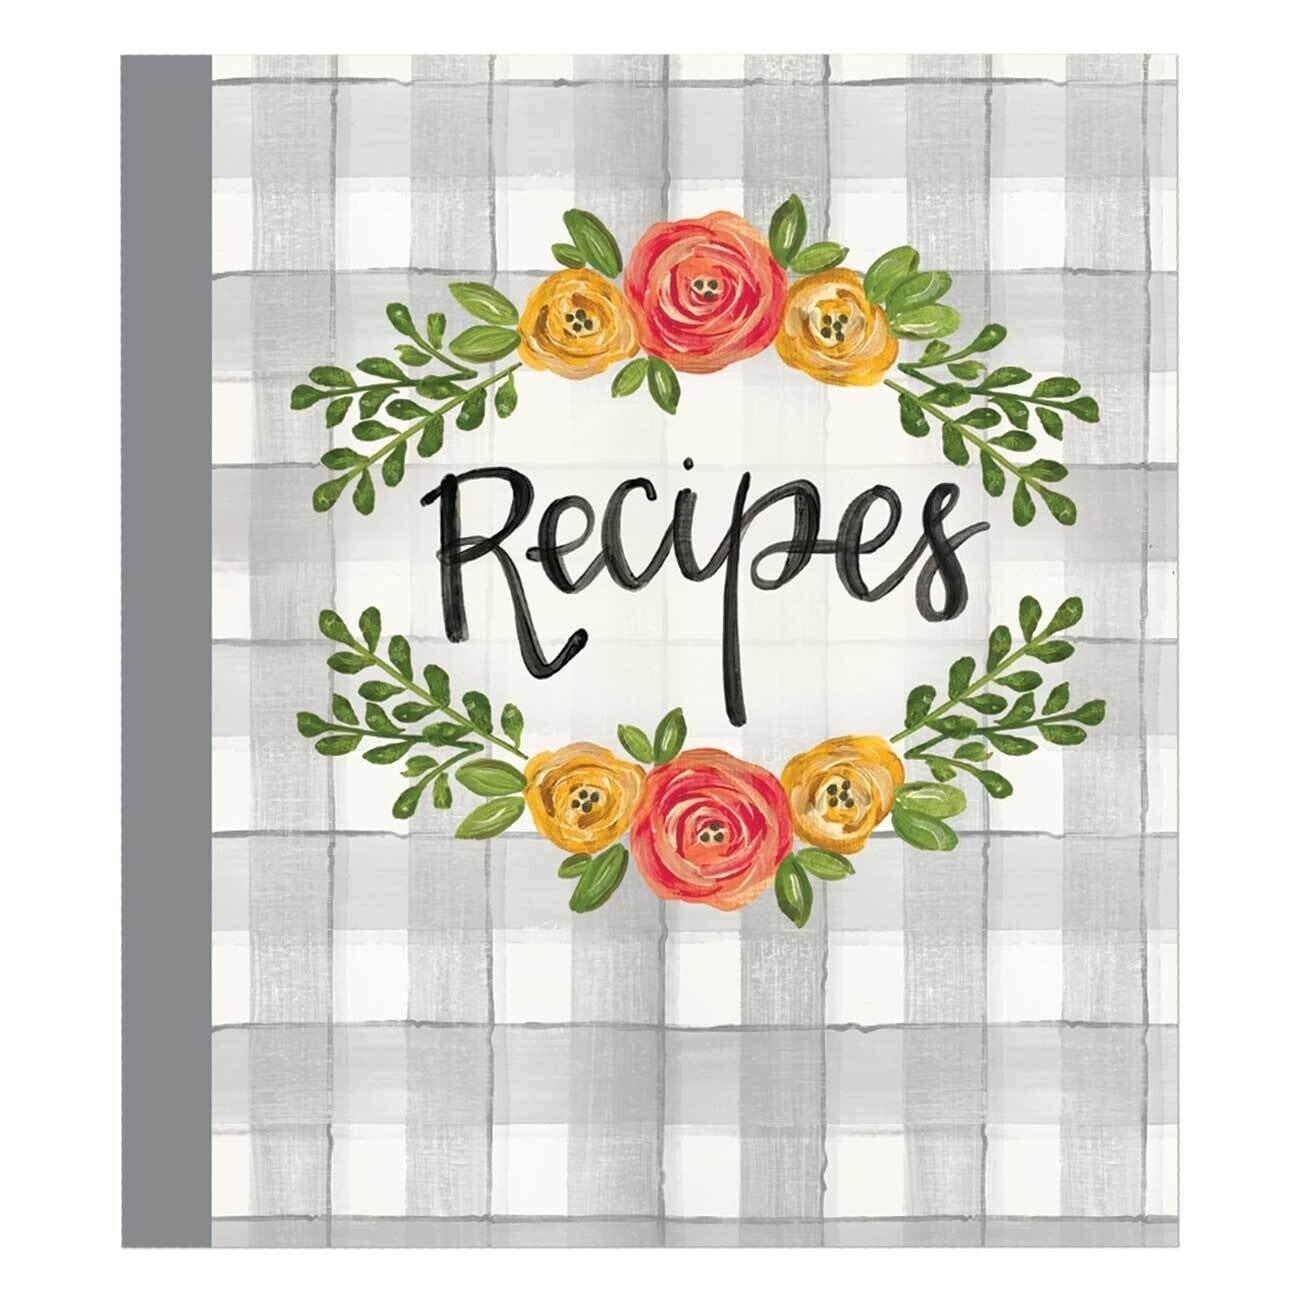 Brownlow Recipe Binder - Floral